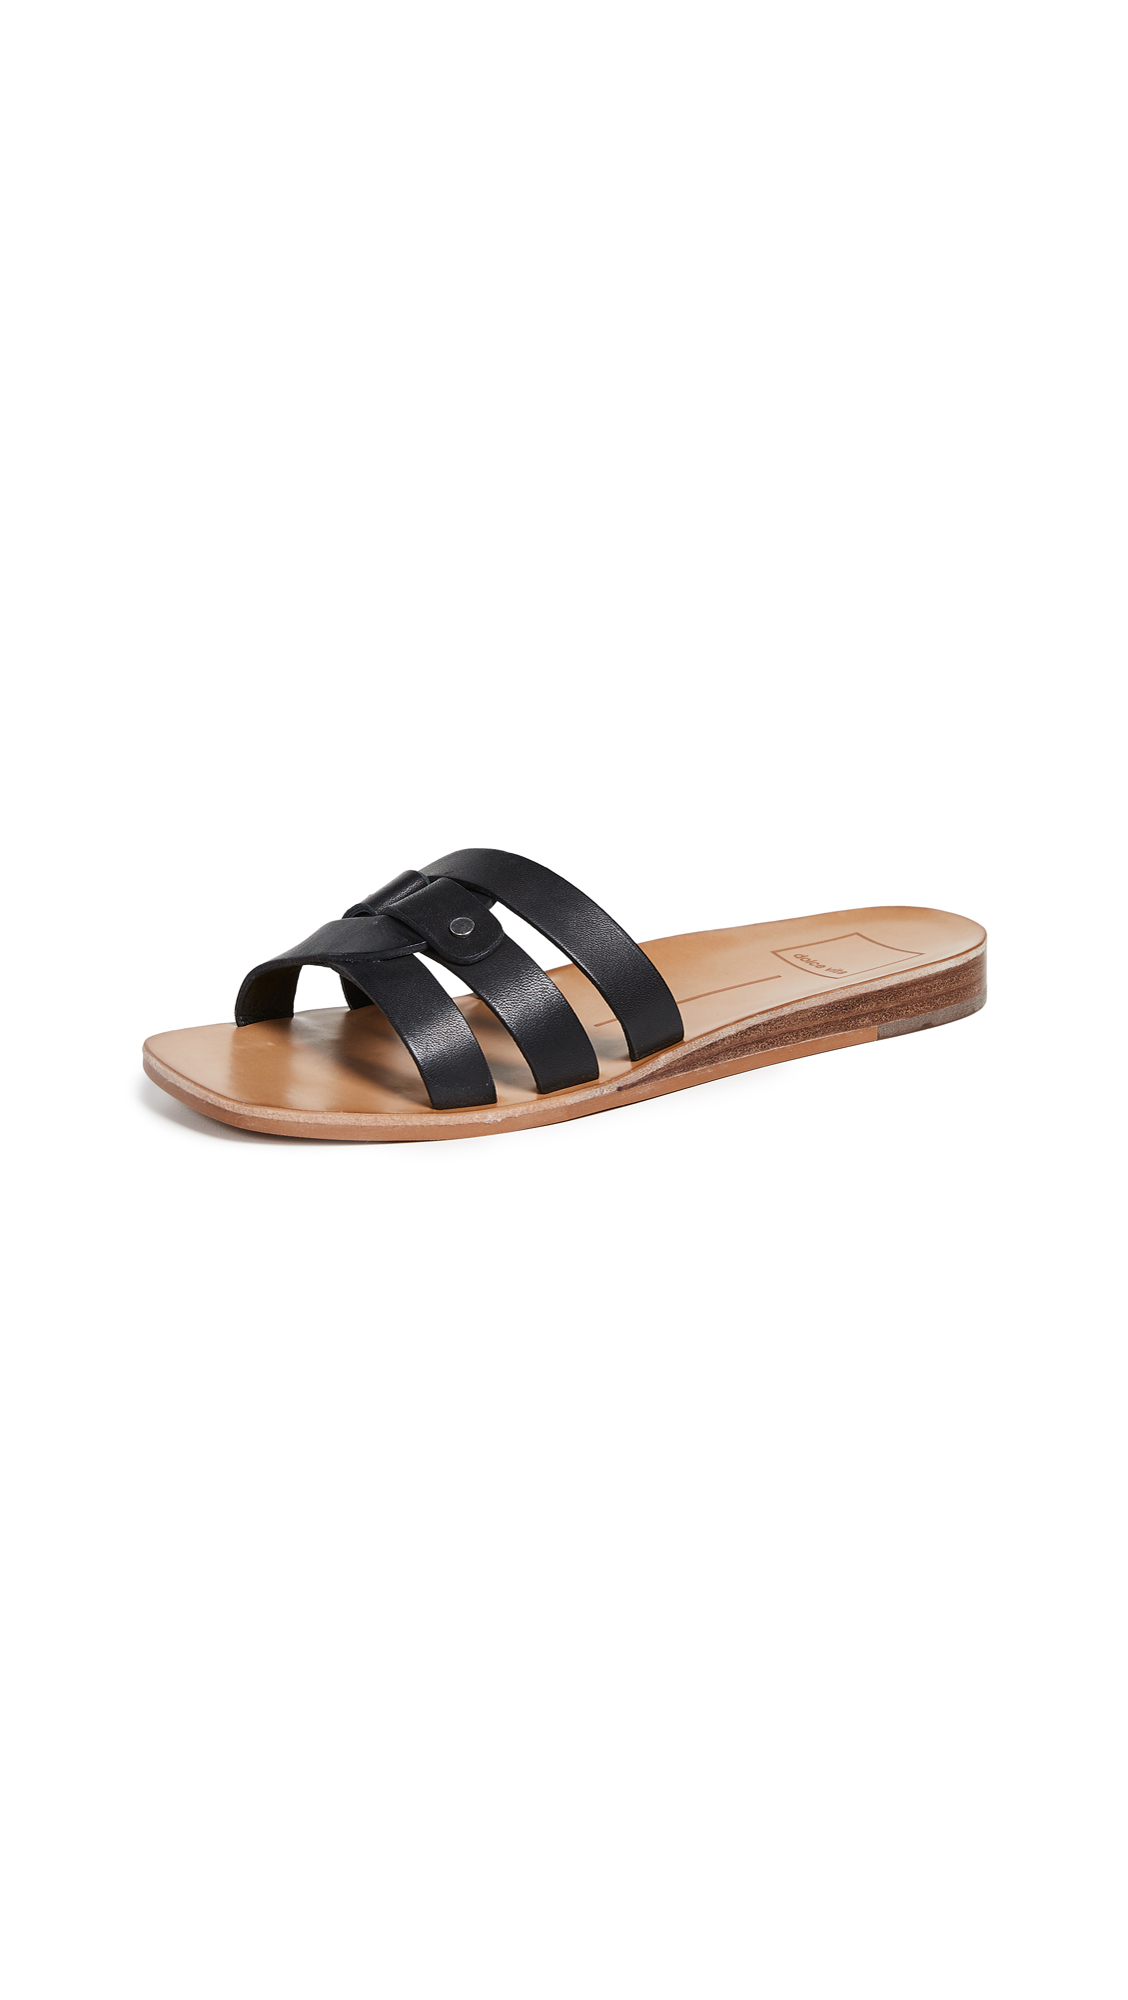 Dolce Vita Cait Slides - Black